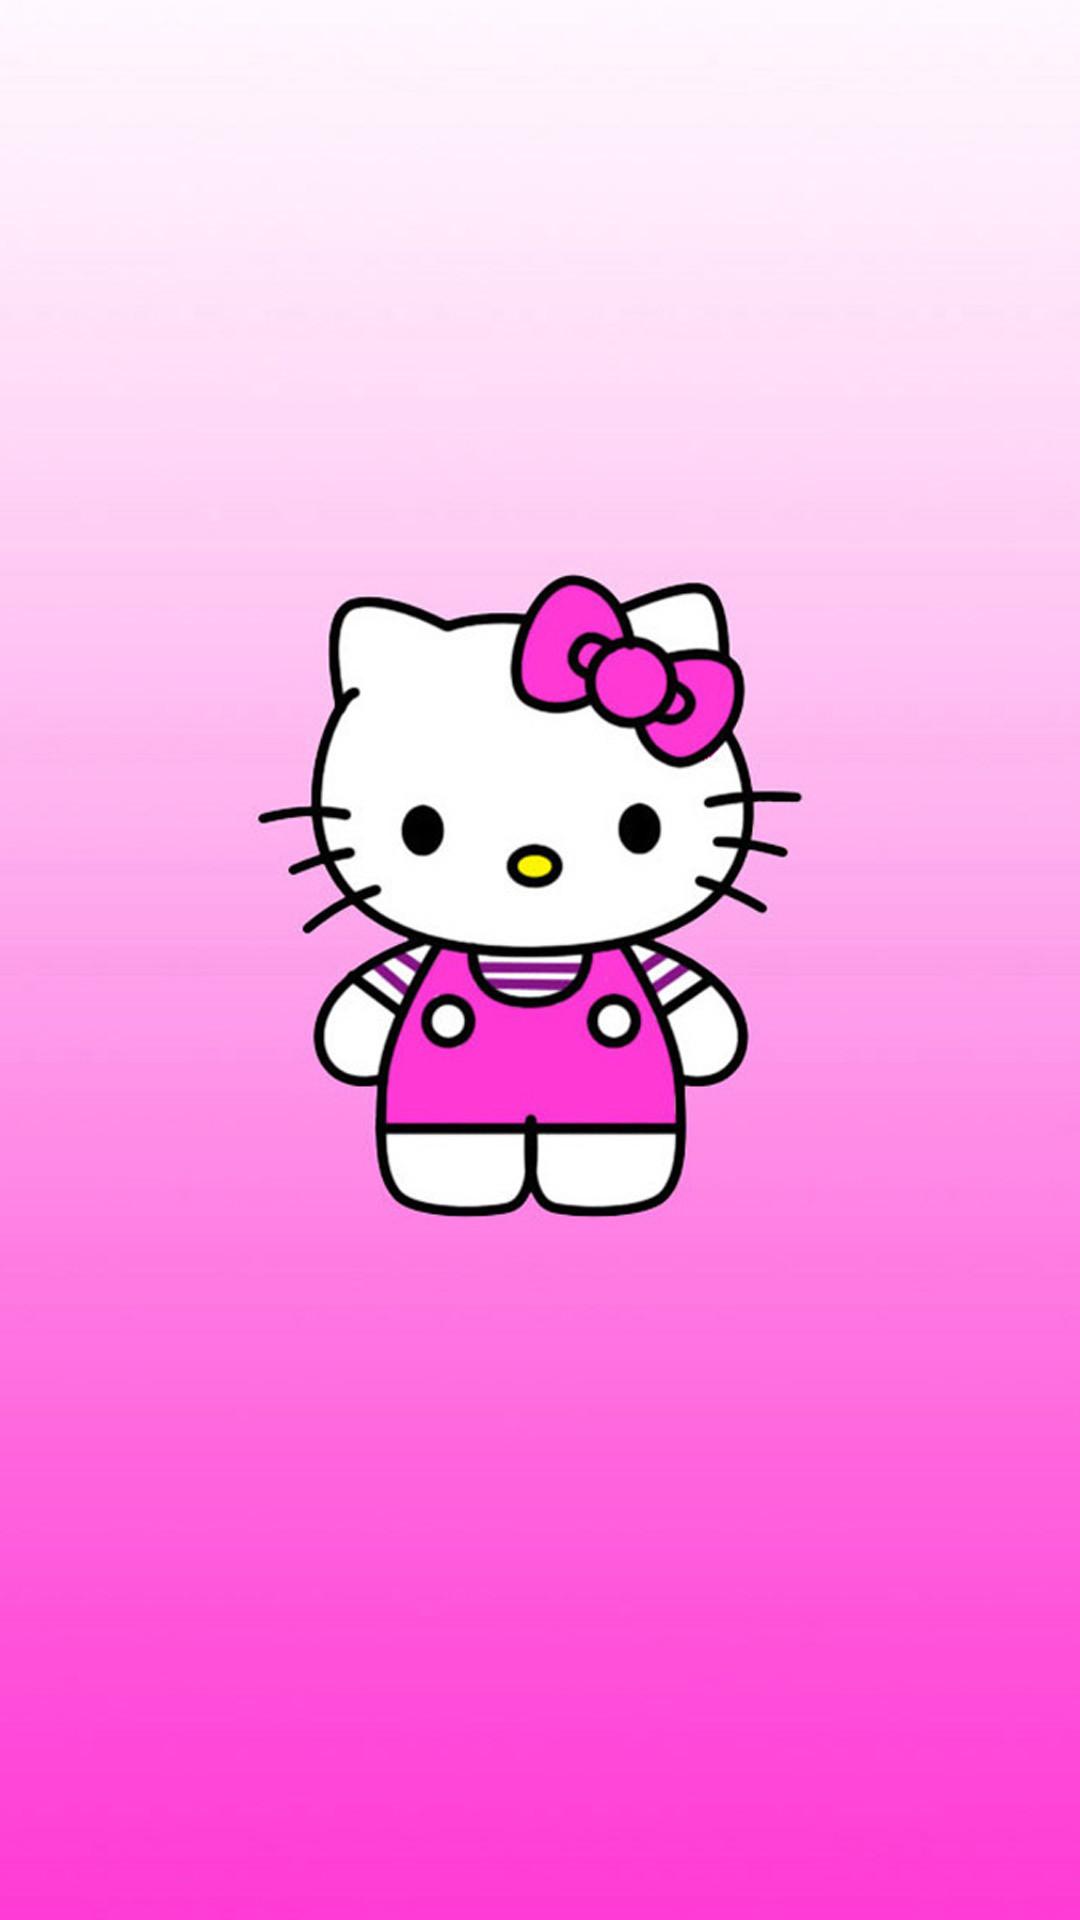 Beautiful Wallpaper Hello Kitty Punk - 724987-hello-kitty-wallpaper-for-pc-1080x1920-for-4k  Image_71648.jpg